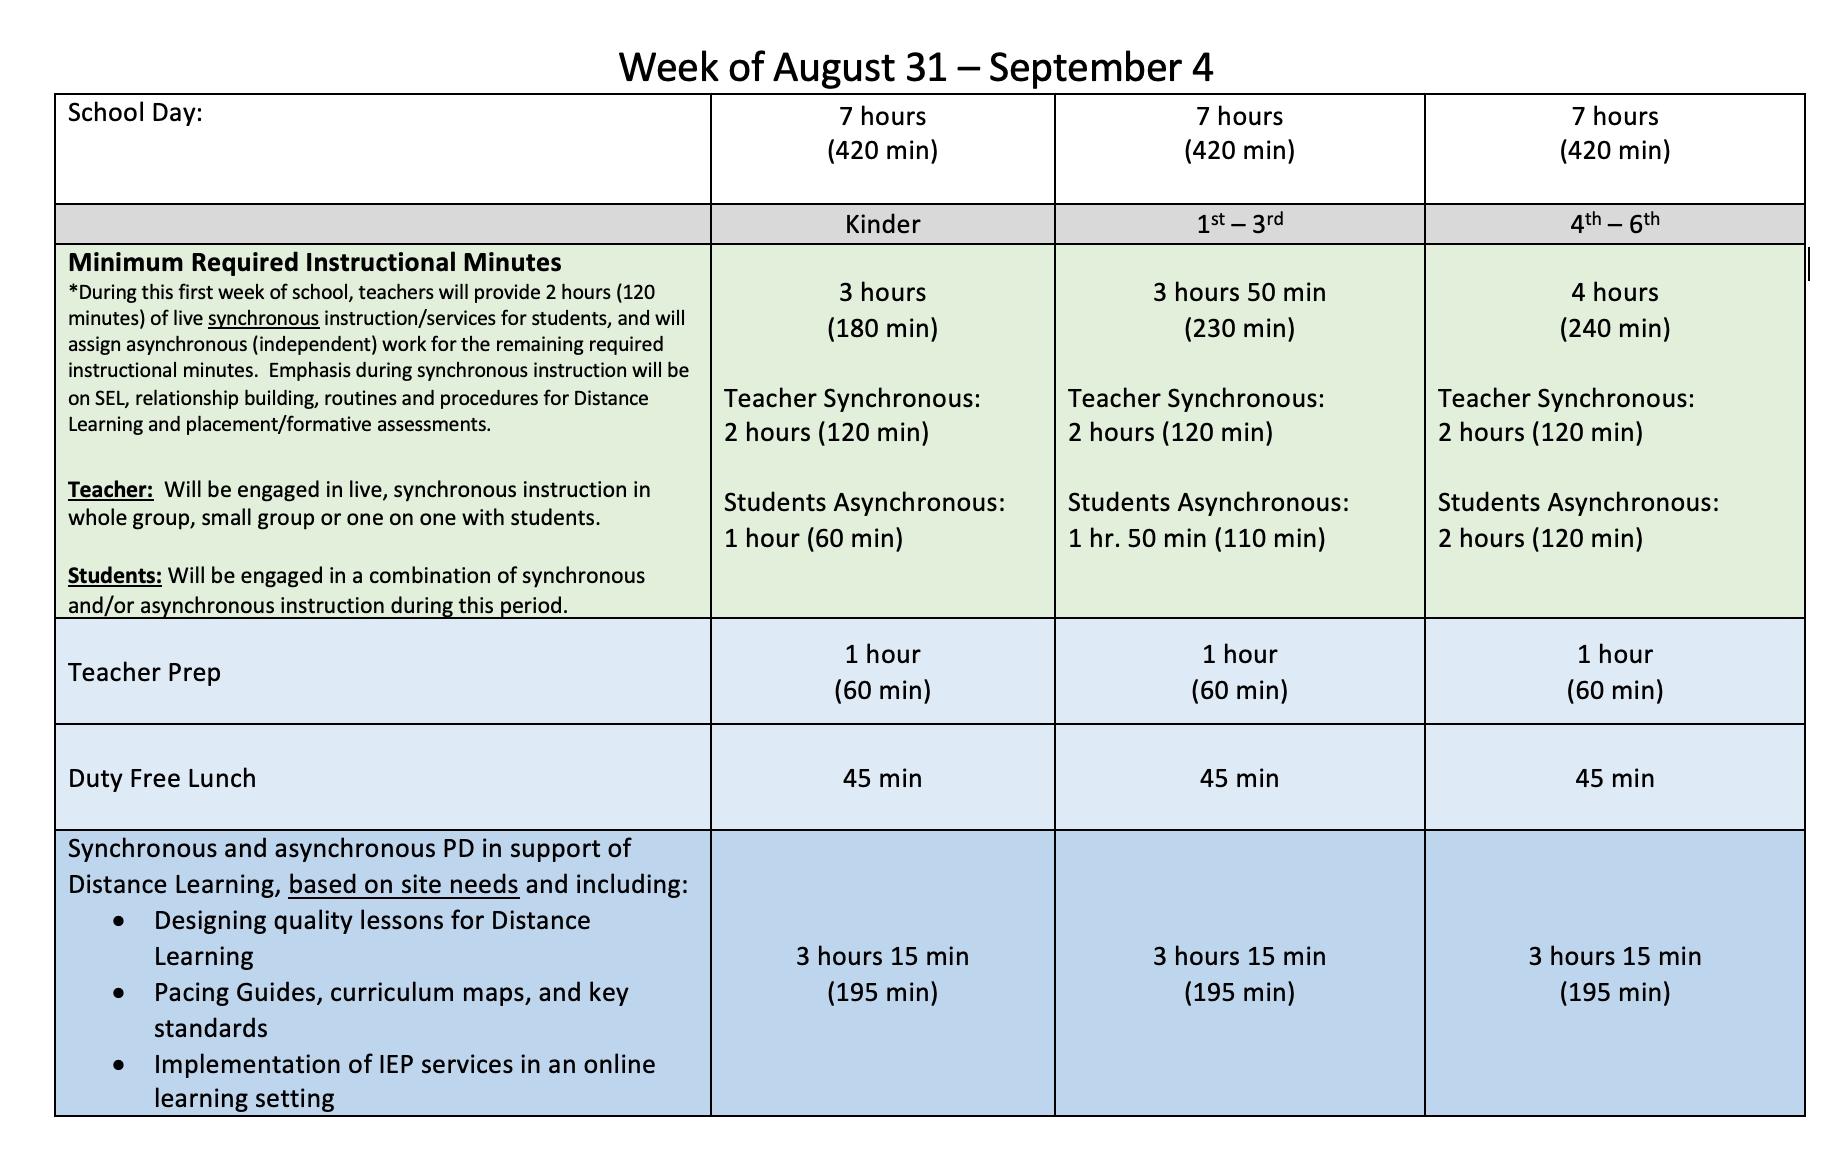 Collect Chula Vista Elementary School Calendar 2021